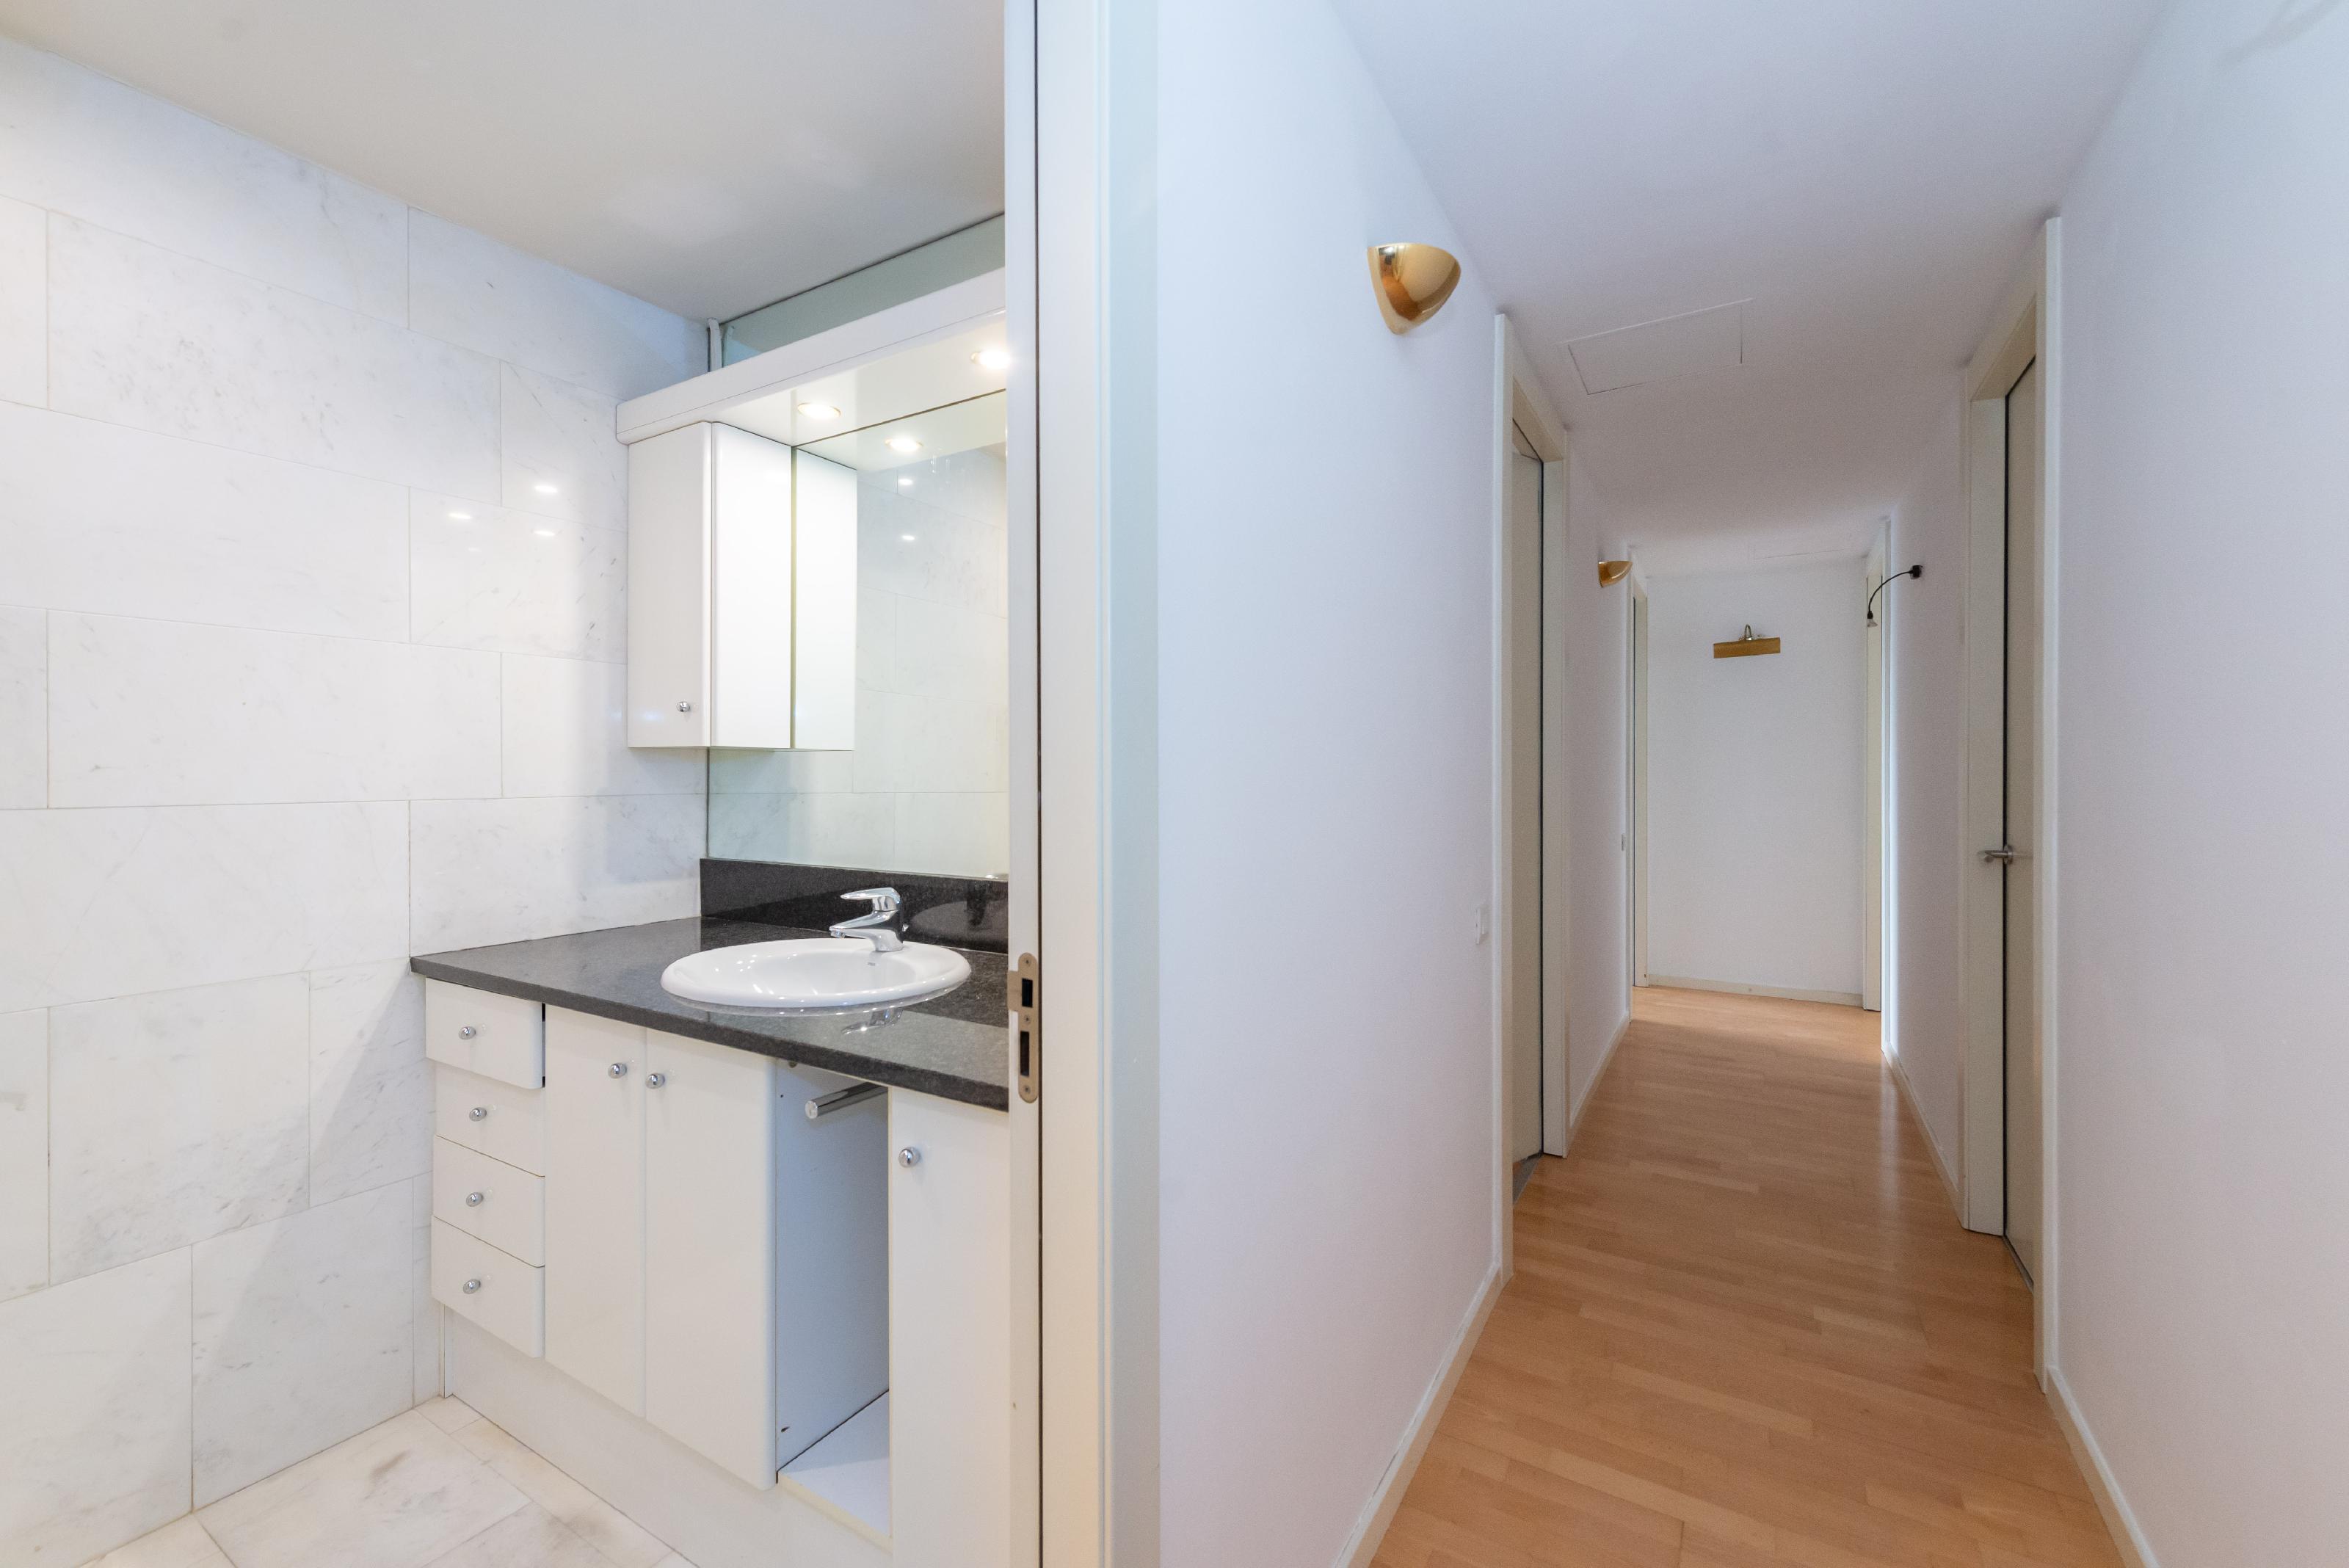 251446 Flat for sale in Sarrià-Sant Gervasi, Tres Torres 28